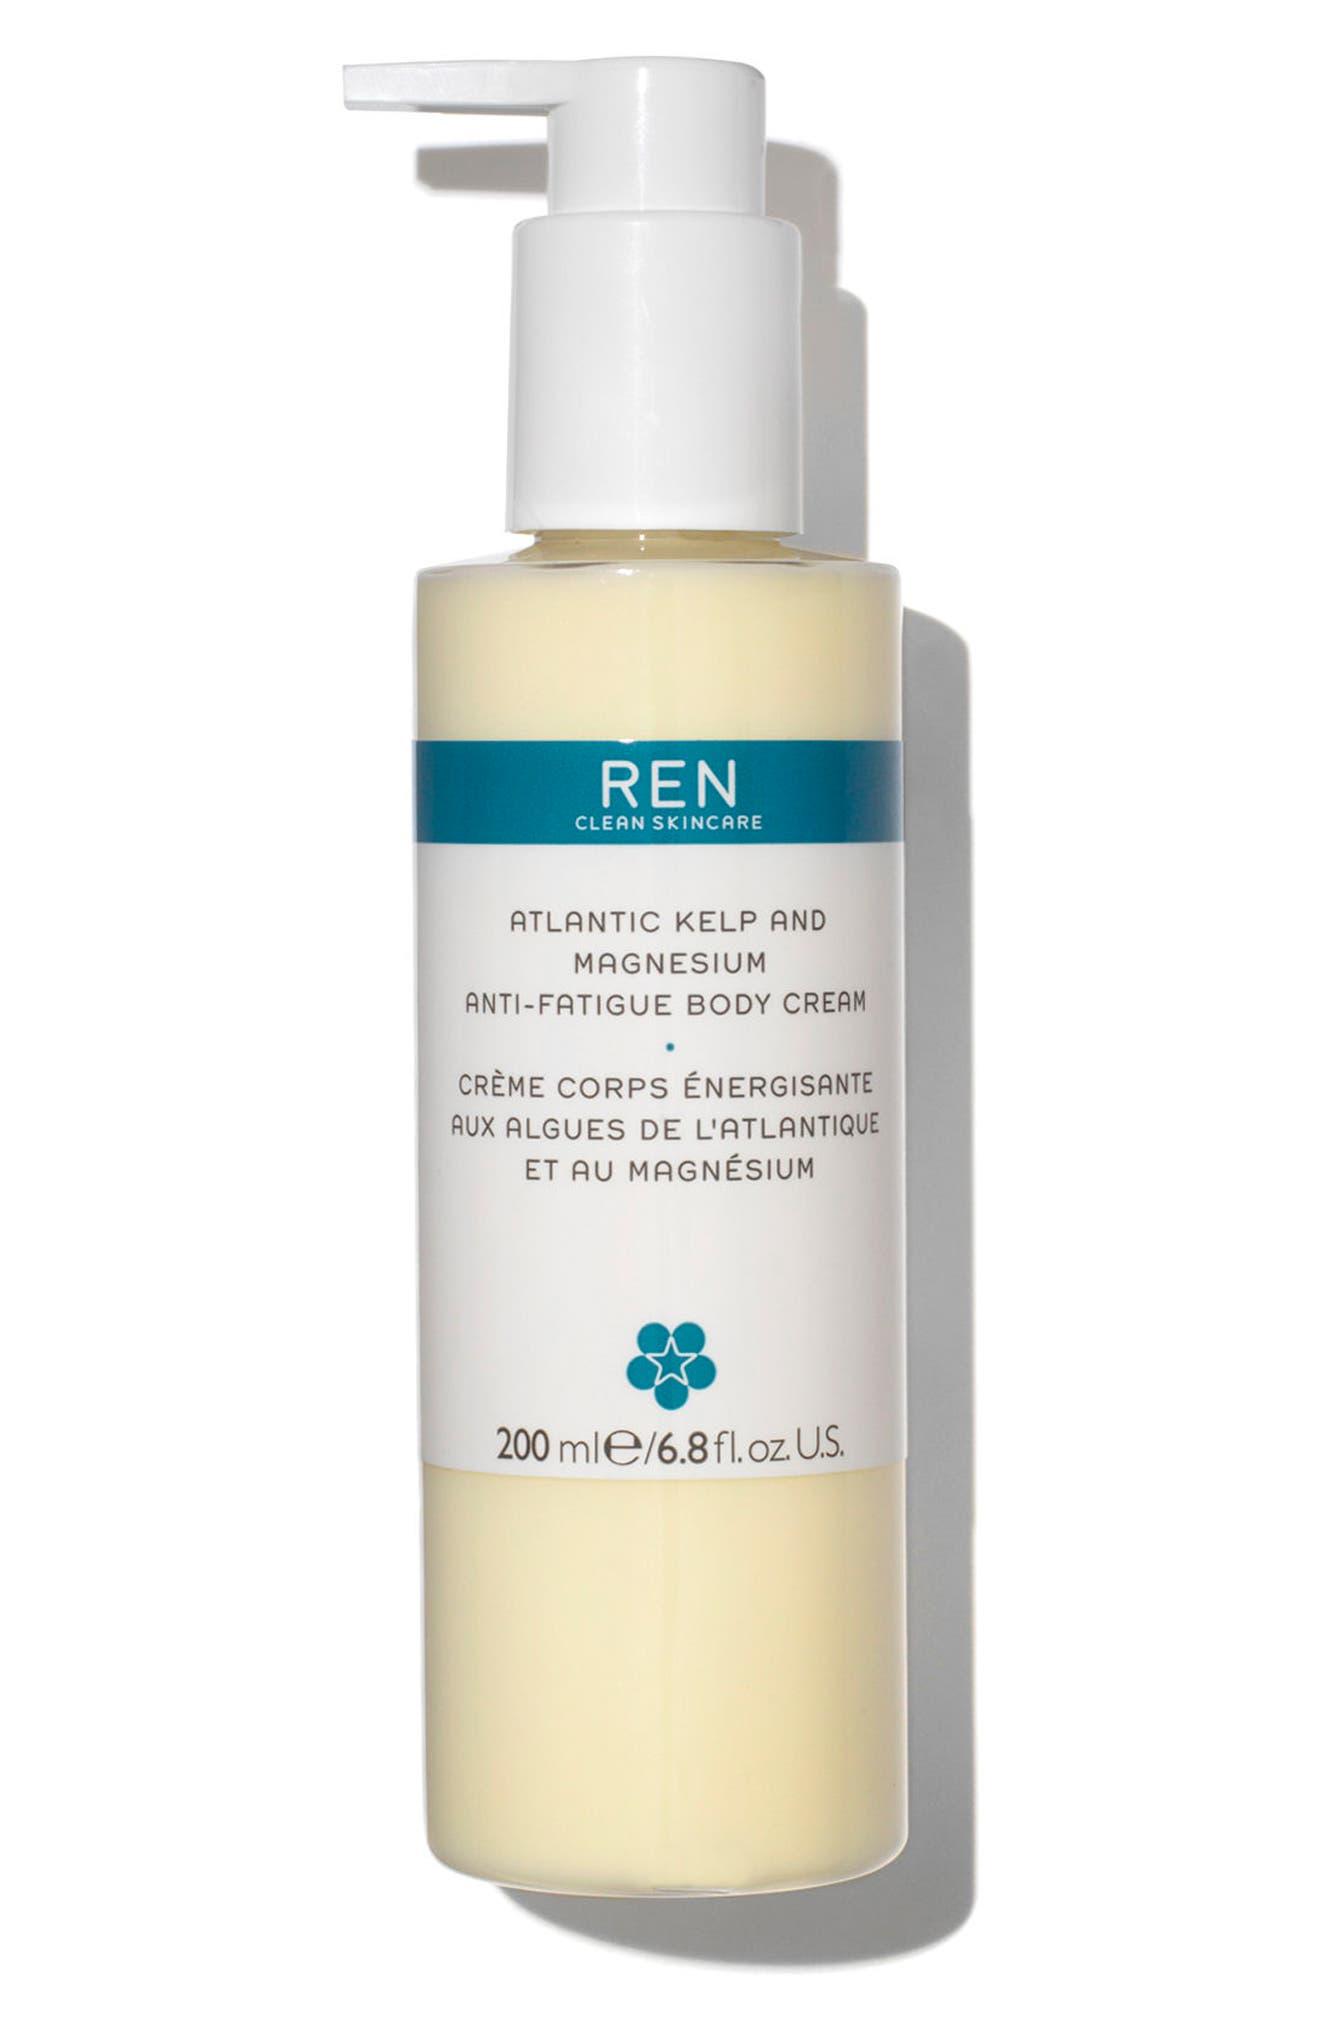 SPACE.NK.apothecary REN Atlantic Kelp and Magnesium Anti-Fatigue Body Cream